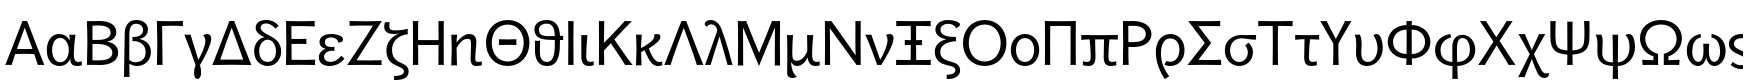 Messiniaka-Regular.otf